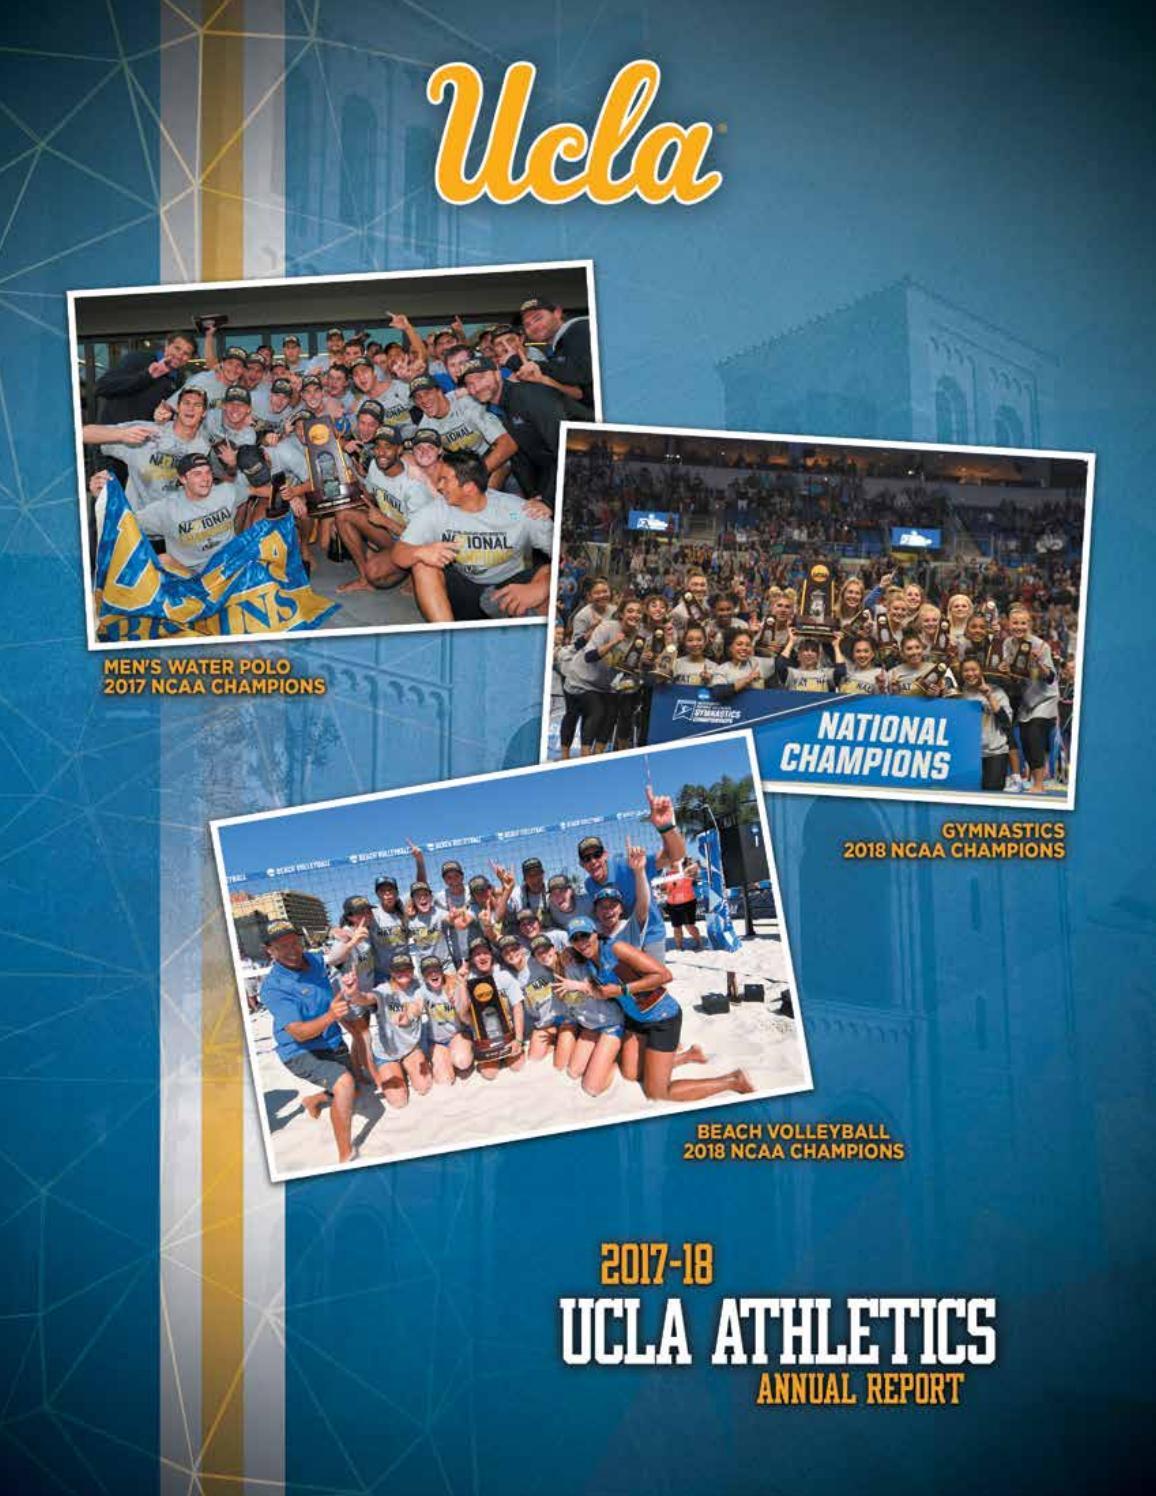 2017-18 UCLA Athletics Annual Report by UCLA Athletics - issuu 4f17a4dcf